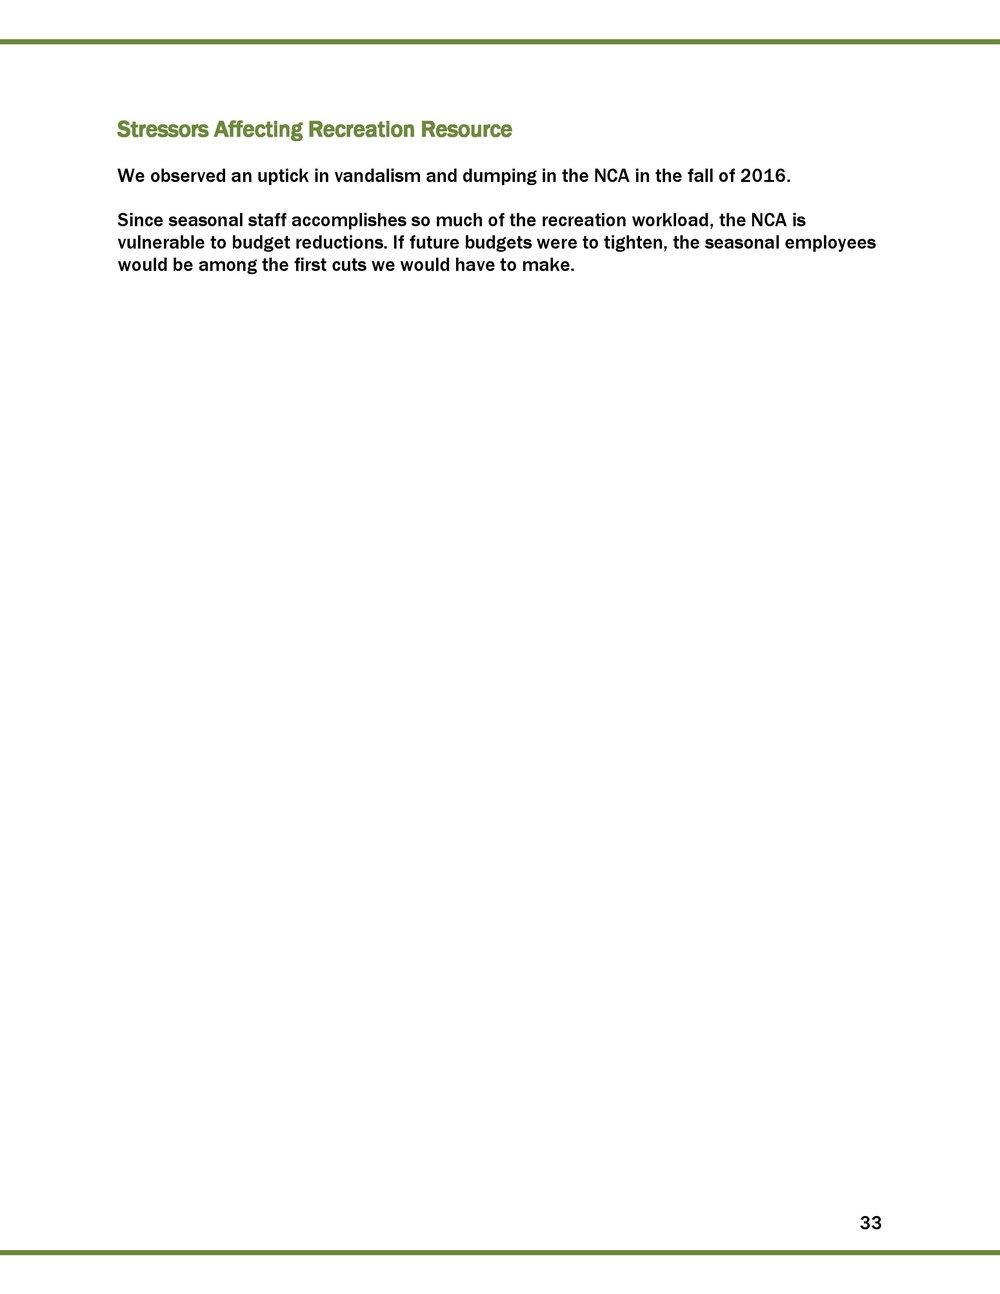 2016 FINAL GGNCA REPORT_2017_02_01-page-034.jpg